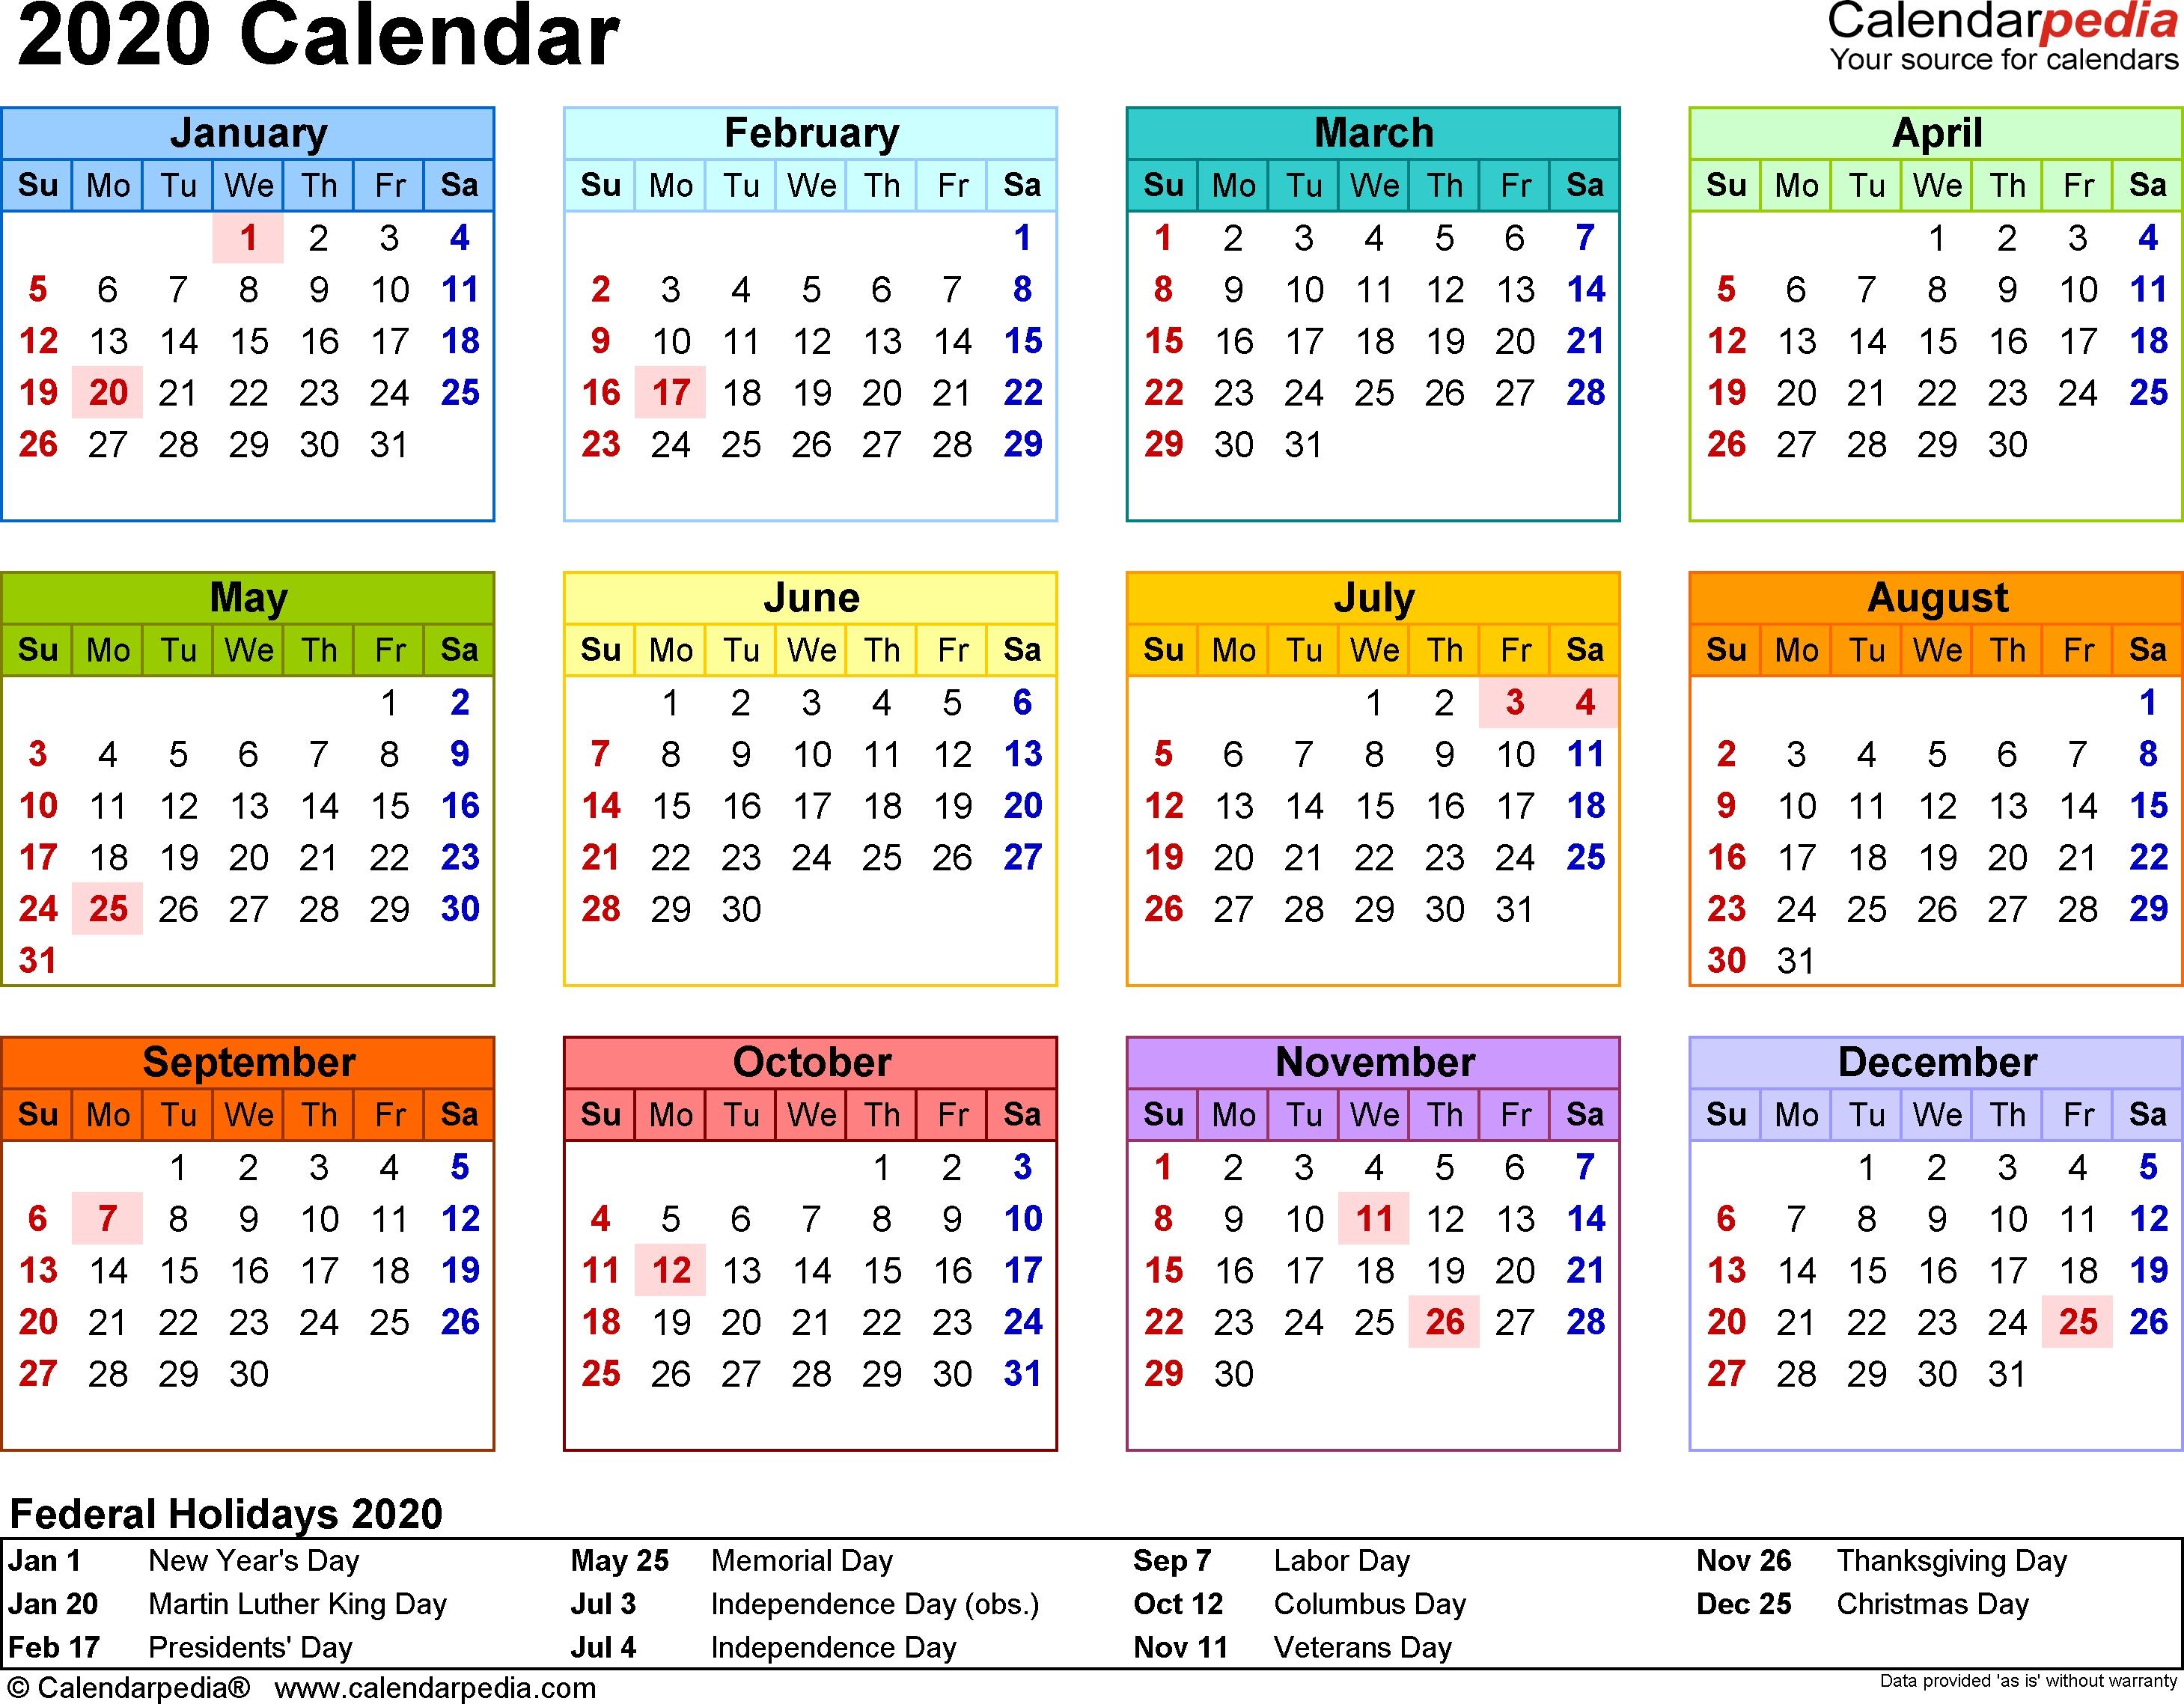 2020 Calendar - Free Printable Microsoft Word Templates 2020 Calendar India Pdf